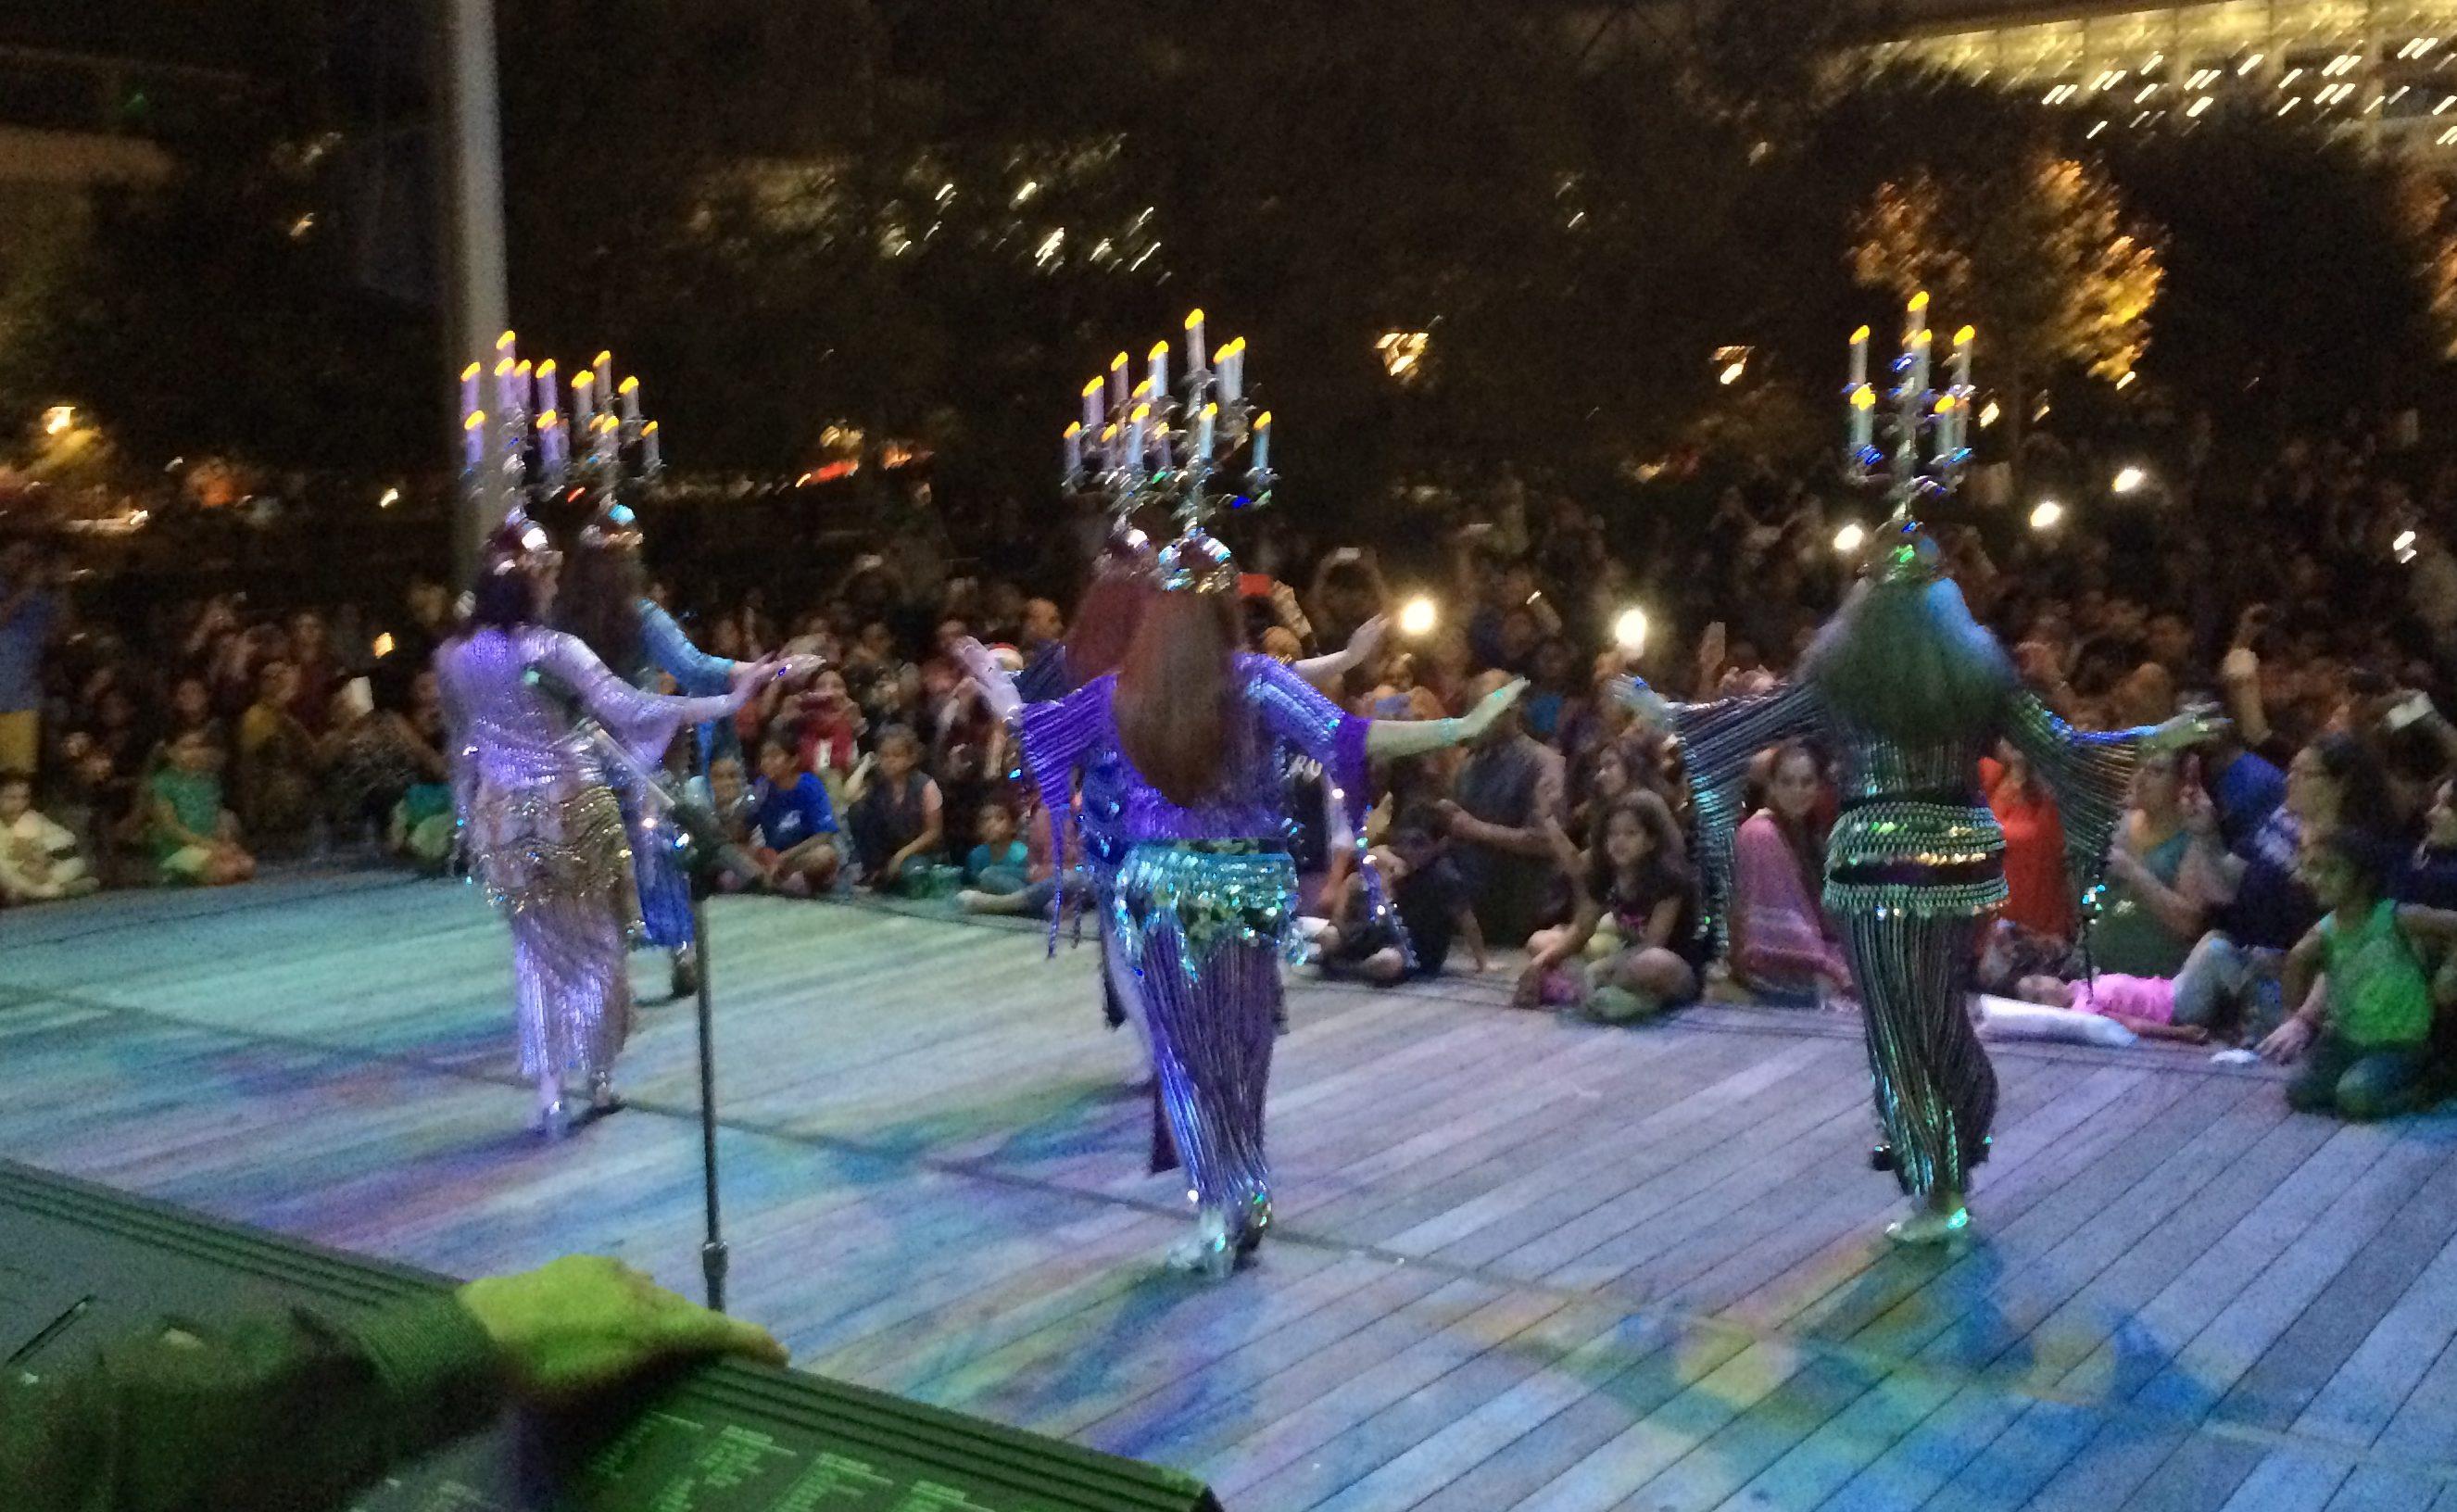 Ahlam Dance Company at Houston's EgyptFest